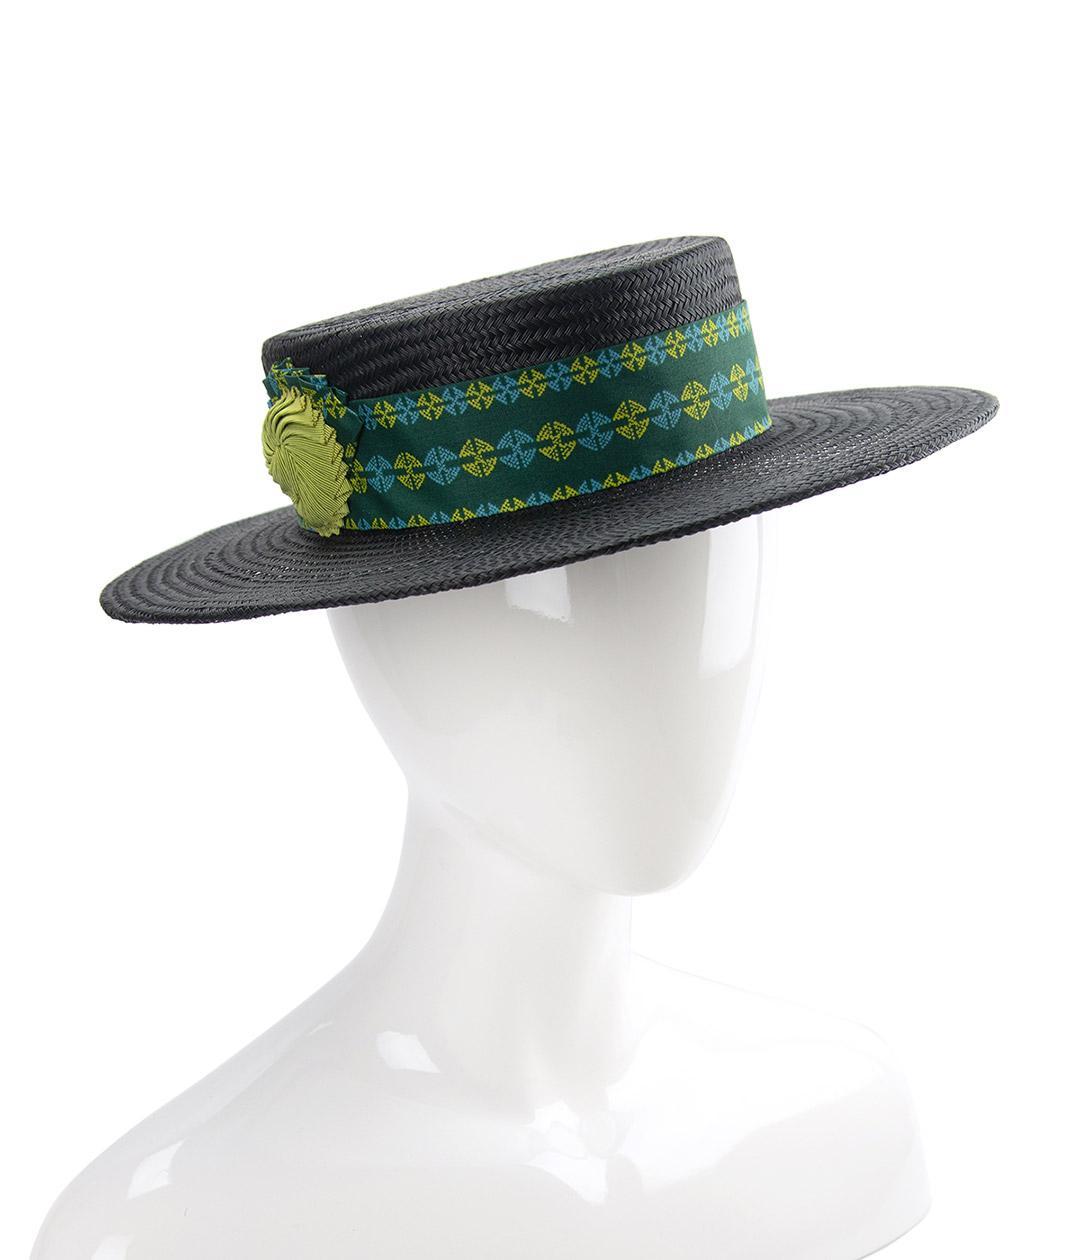 Black straw boater hat